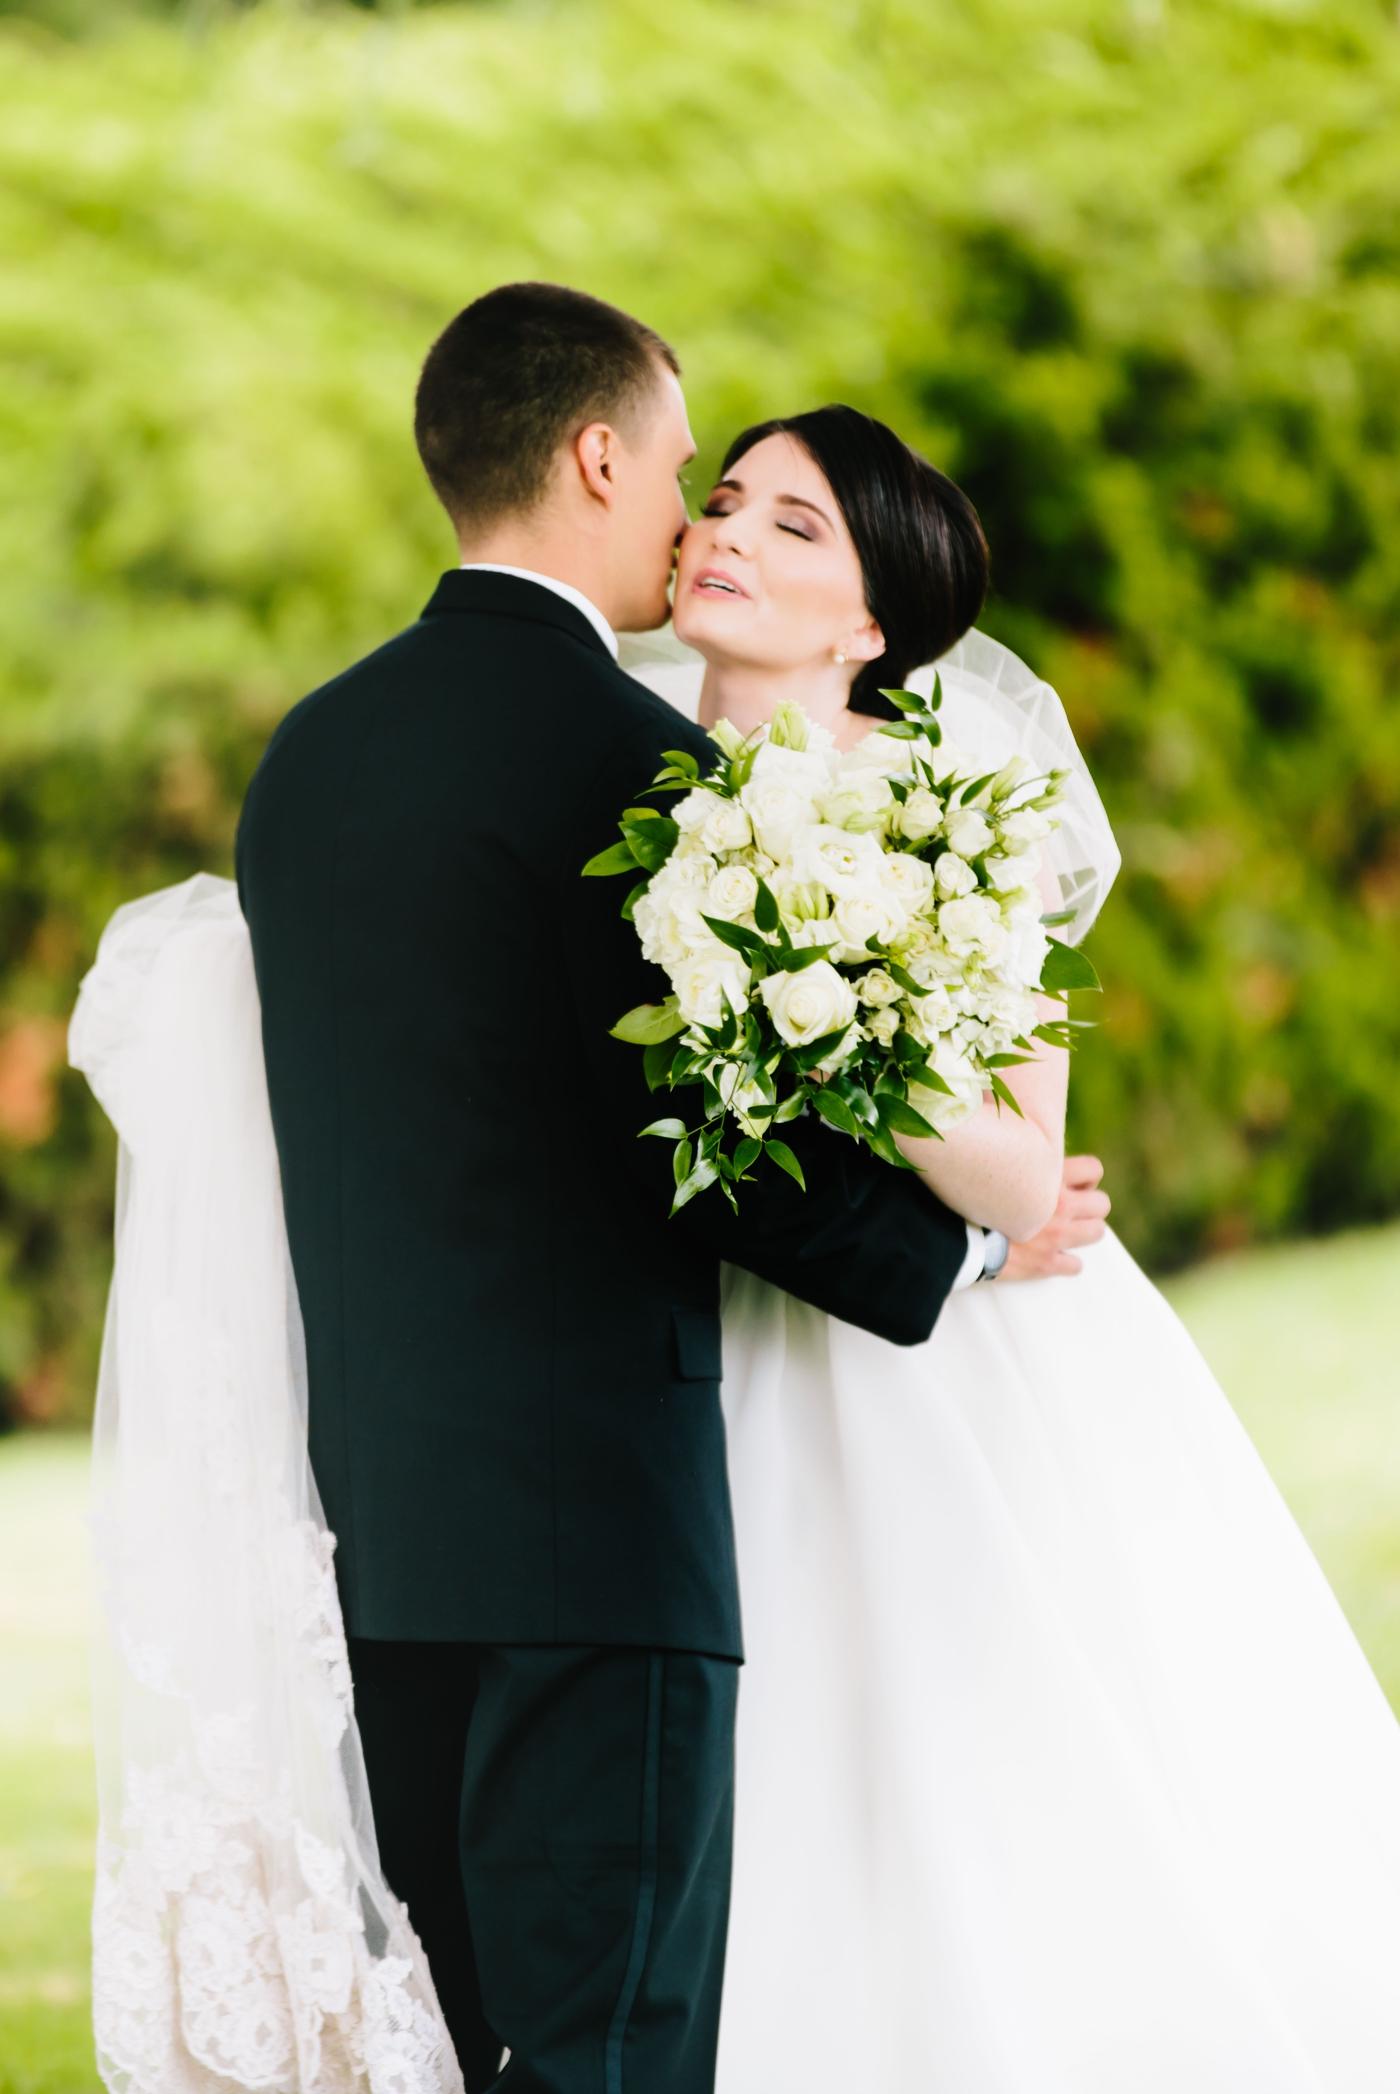 chicago-fine-art-wedding-photography-mccarthy23